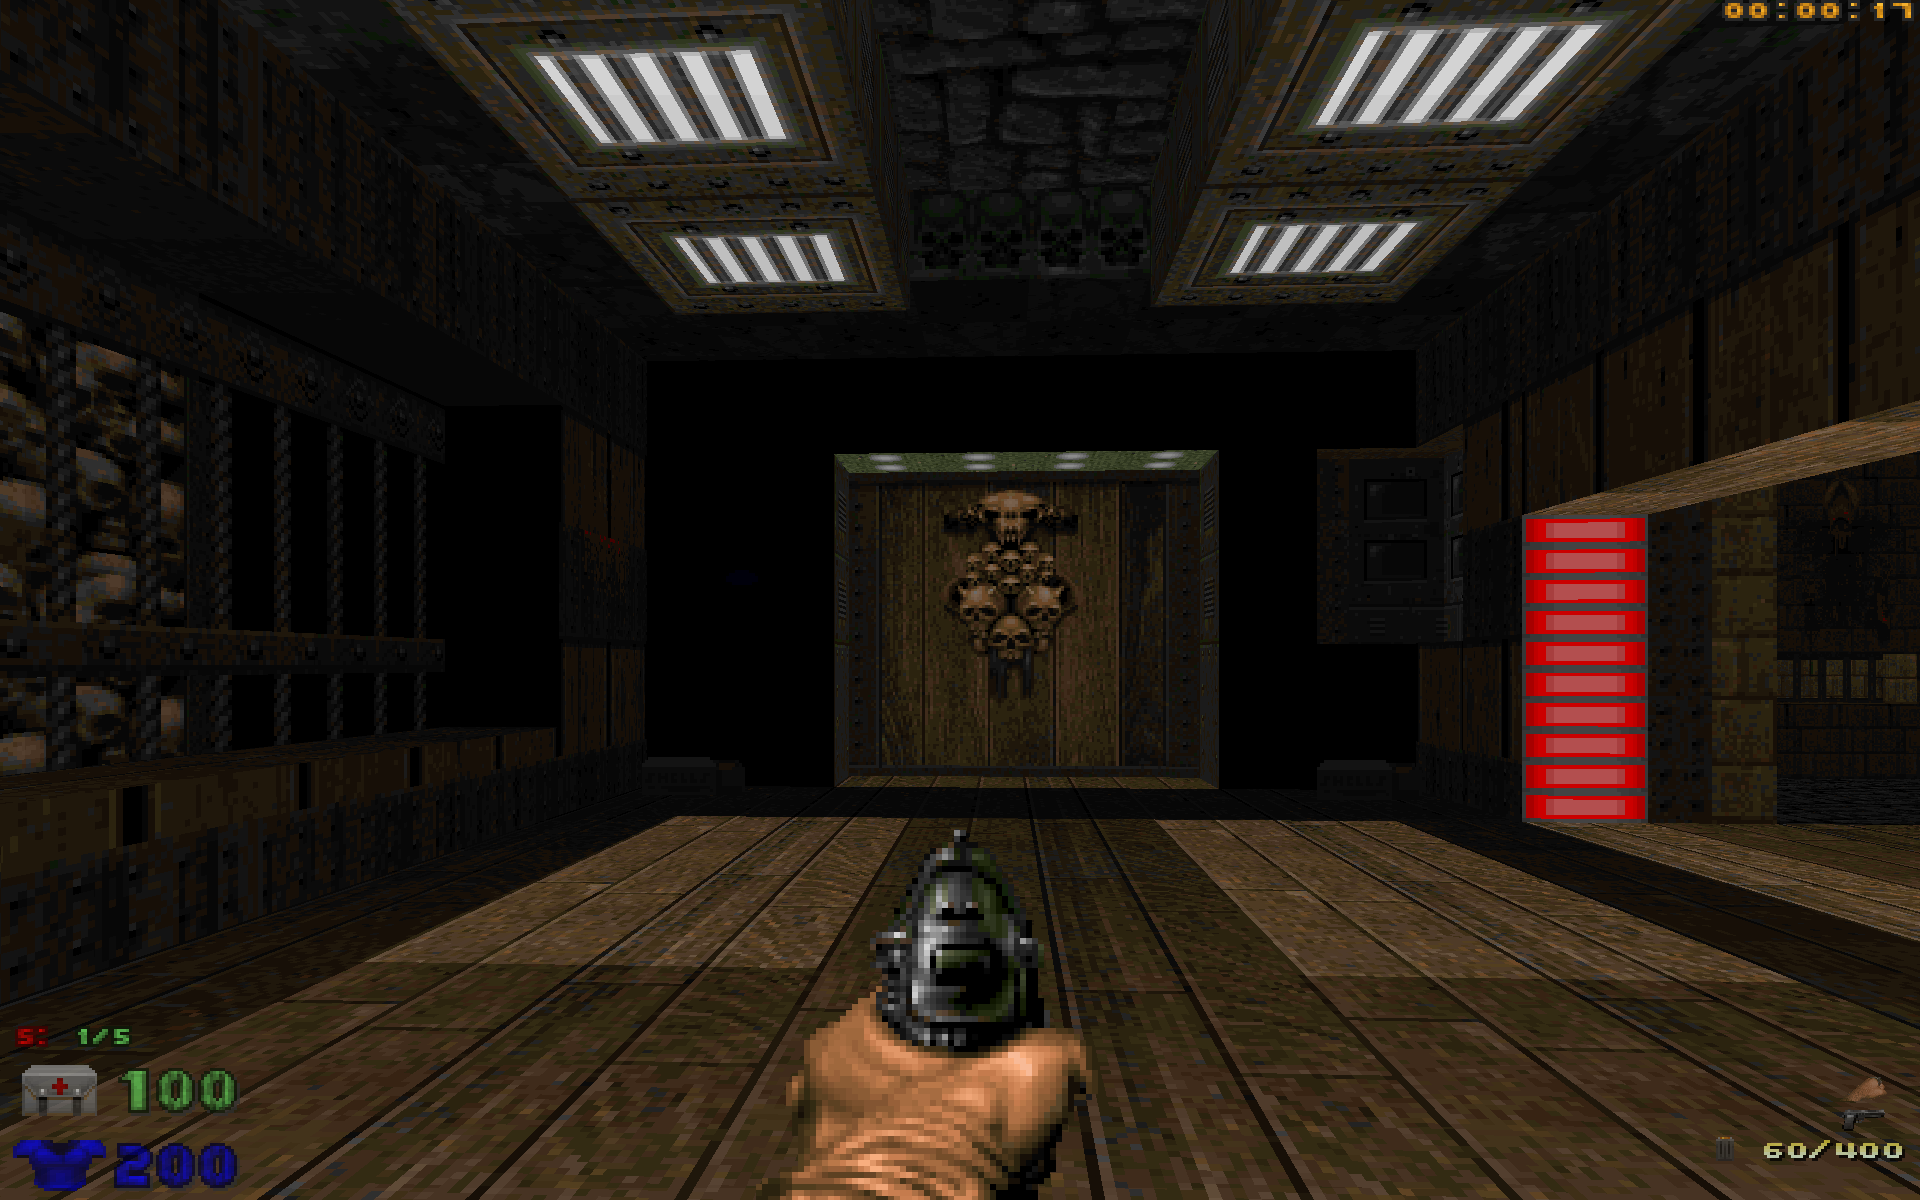 Screenshot_Doom_20210225_111855.png.4db6984c25d53e16f6688e43e59b1439.png